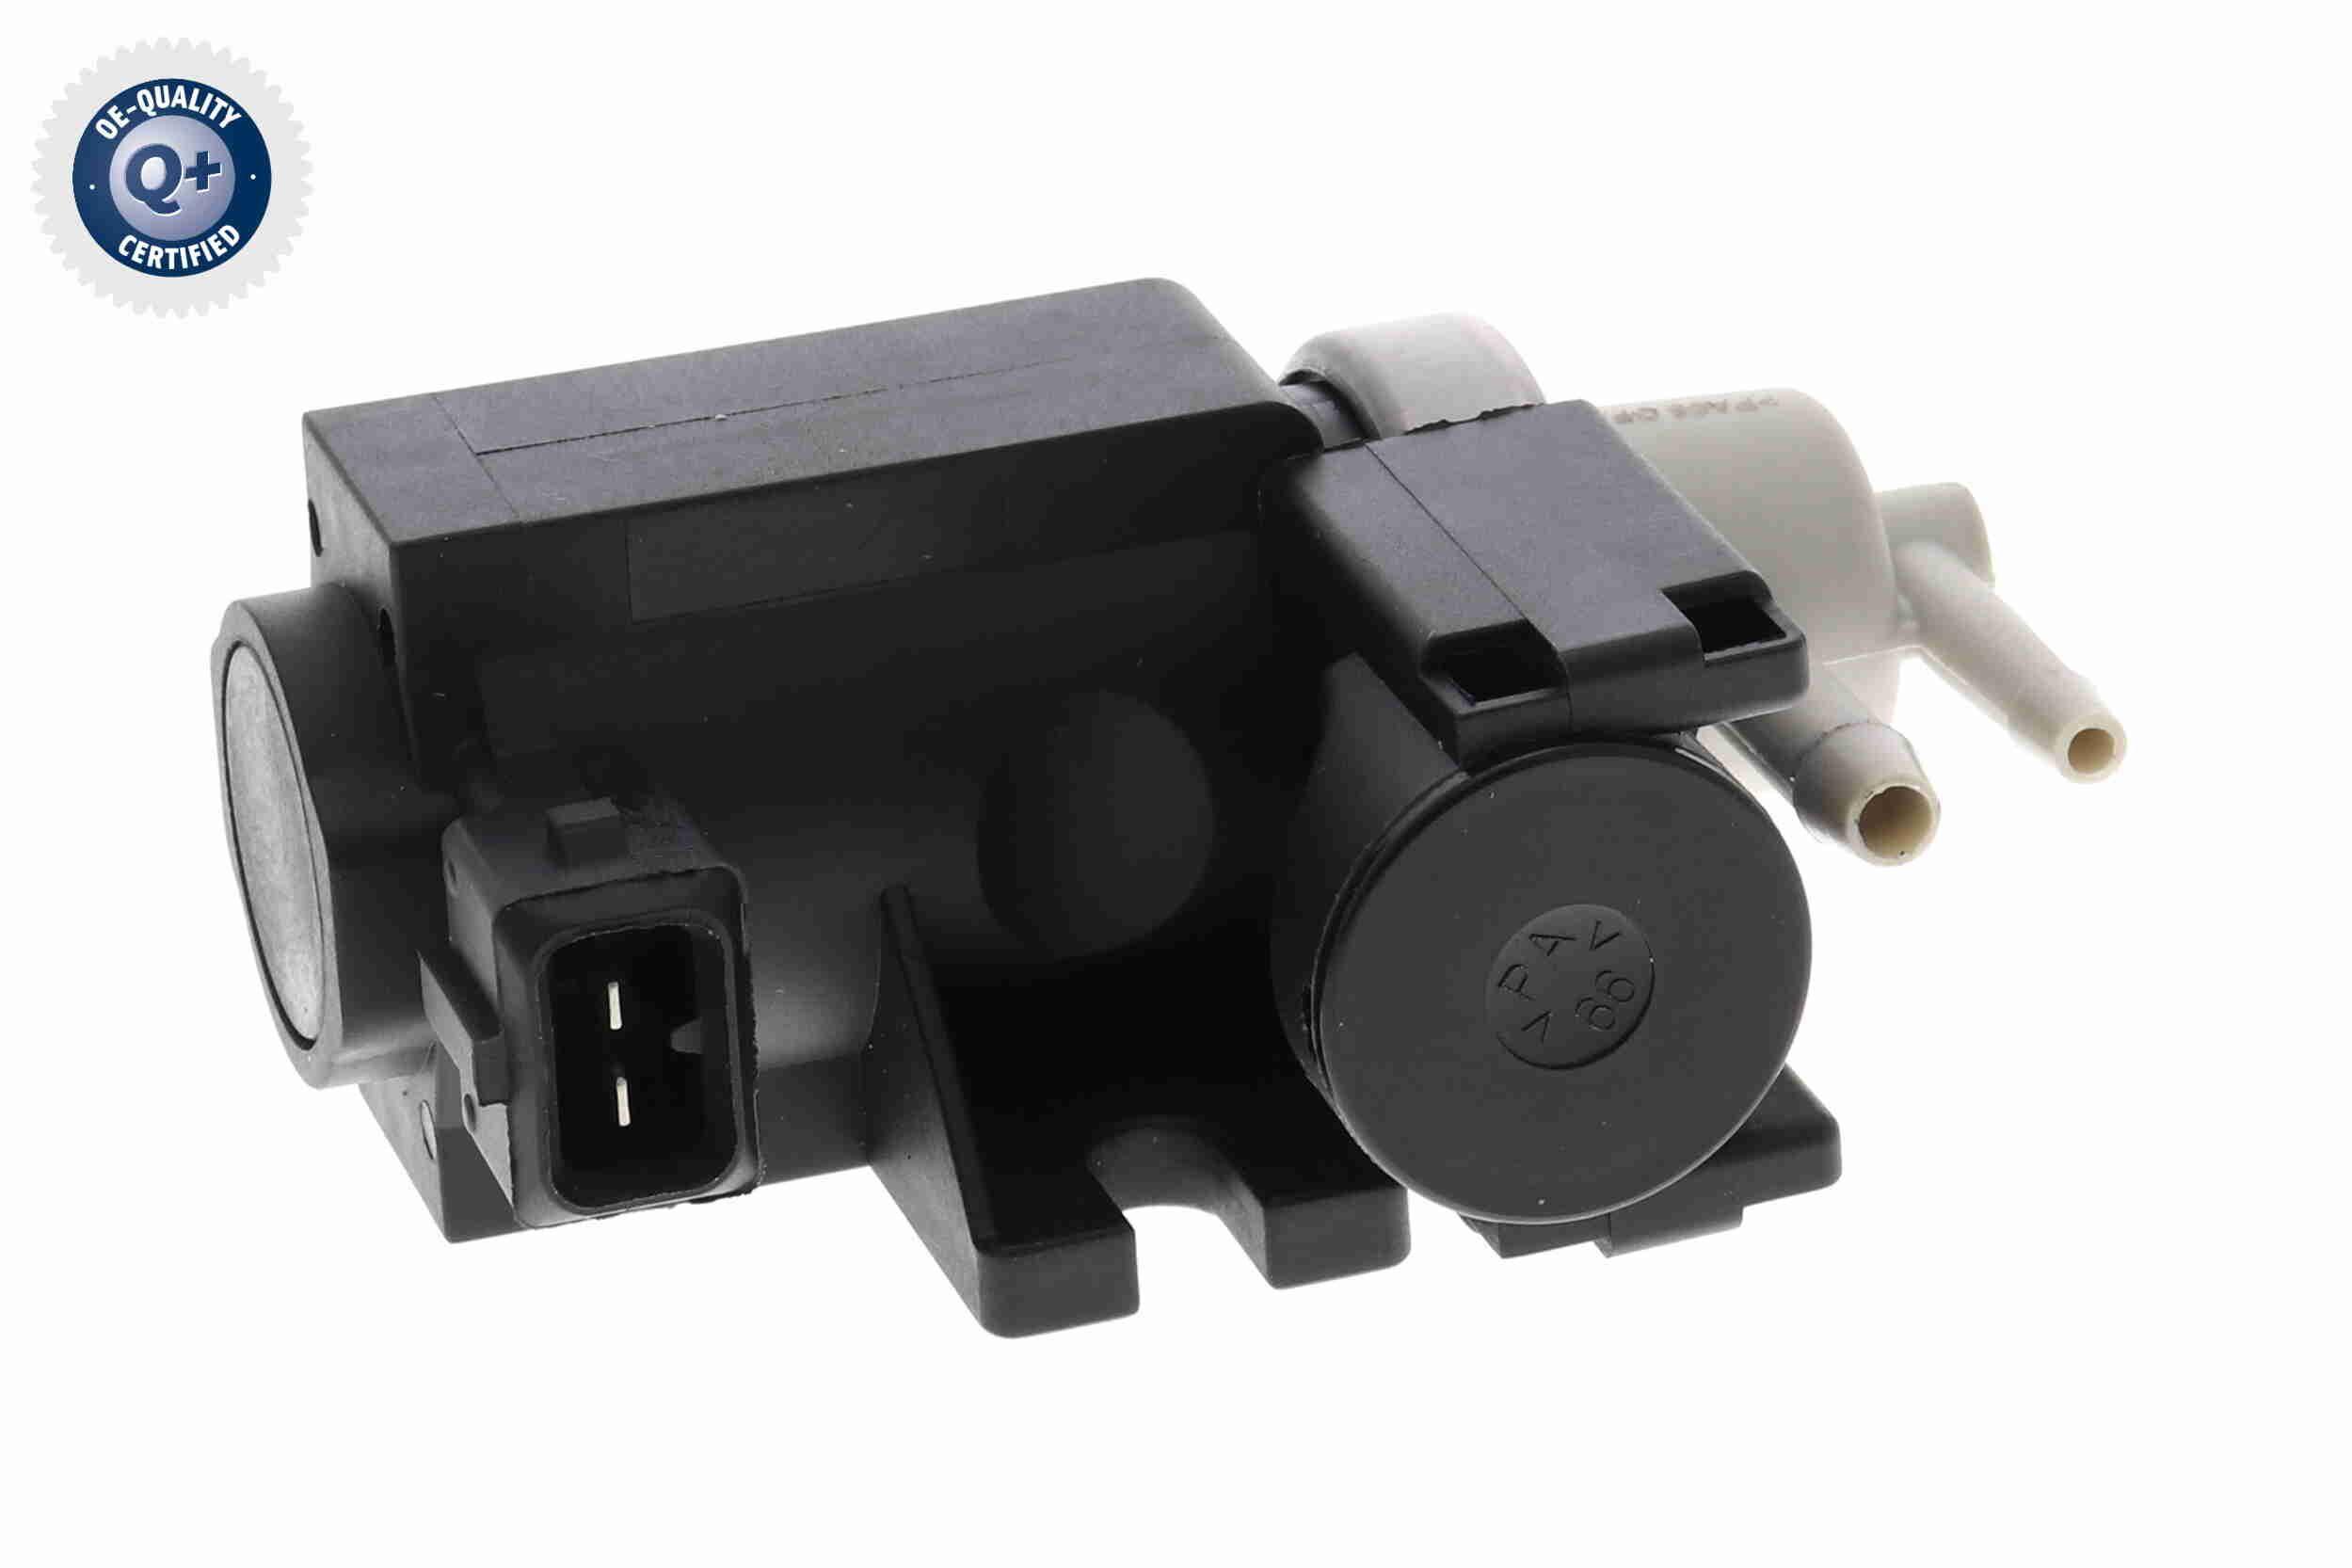 Druckwandler, Abgassteuerung V40-63-0012 VEMO V40-63-0012 in Original Qualität